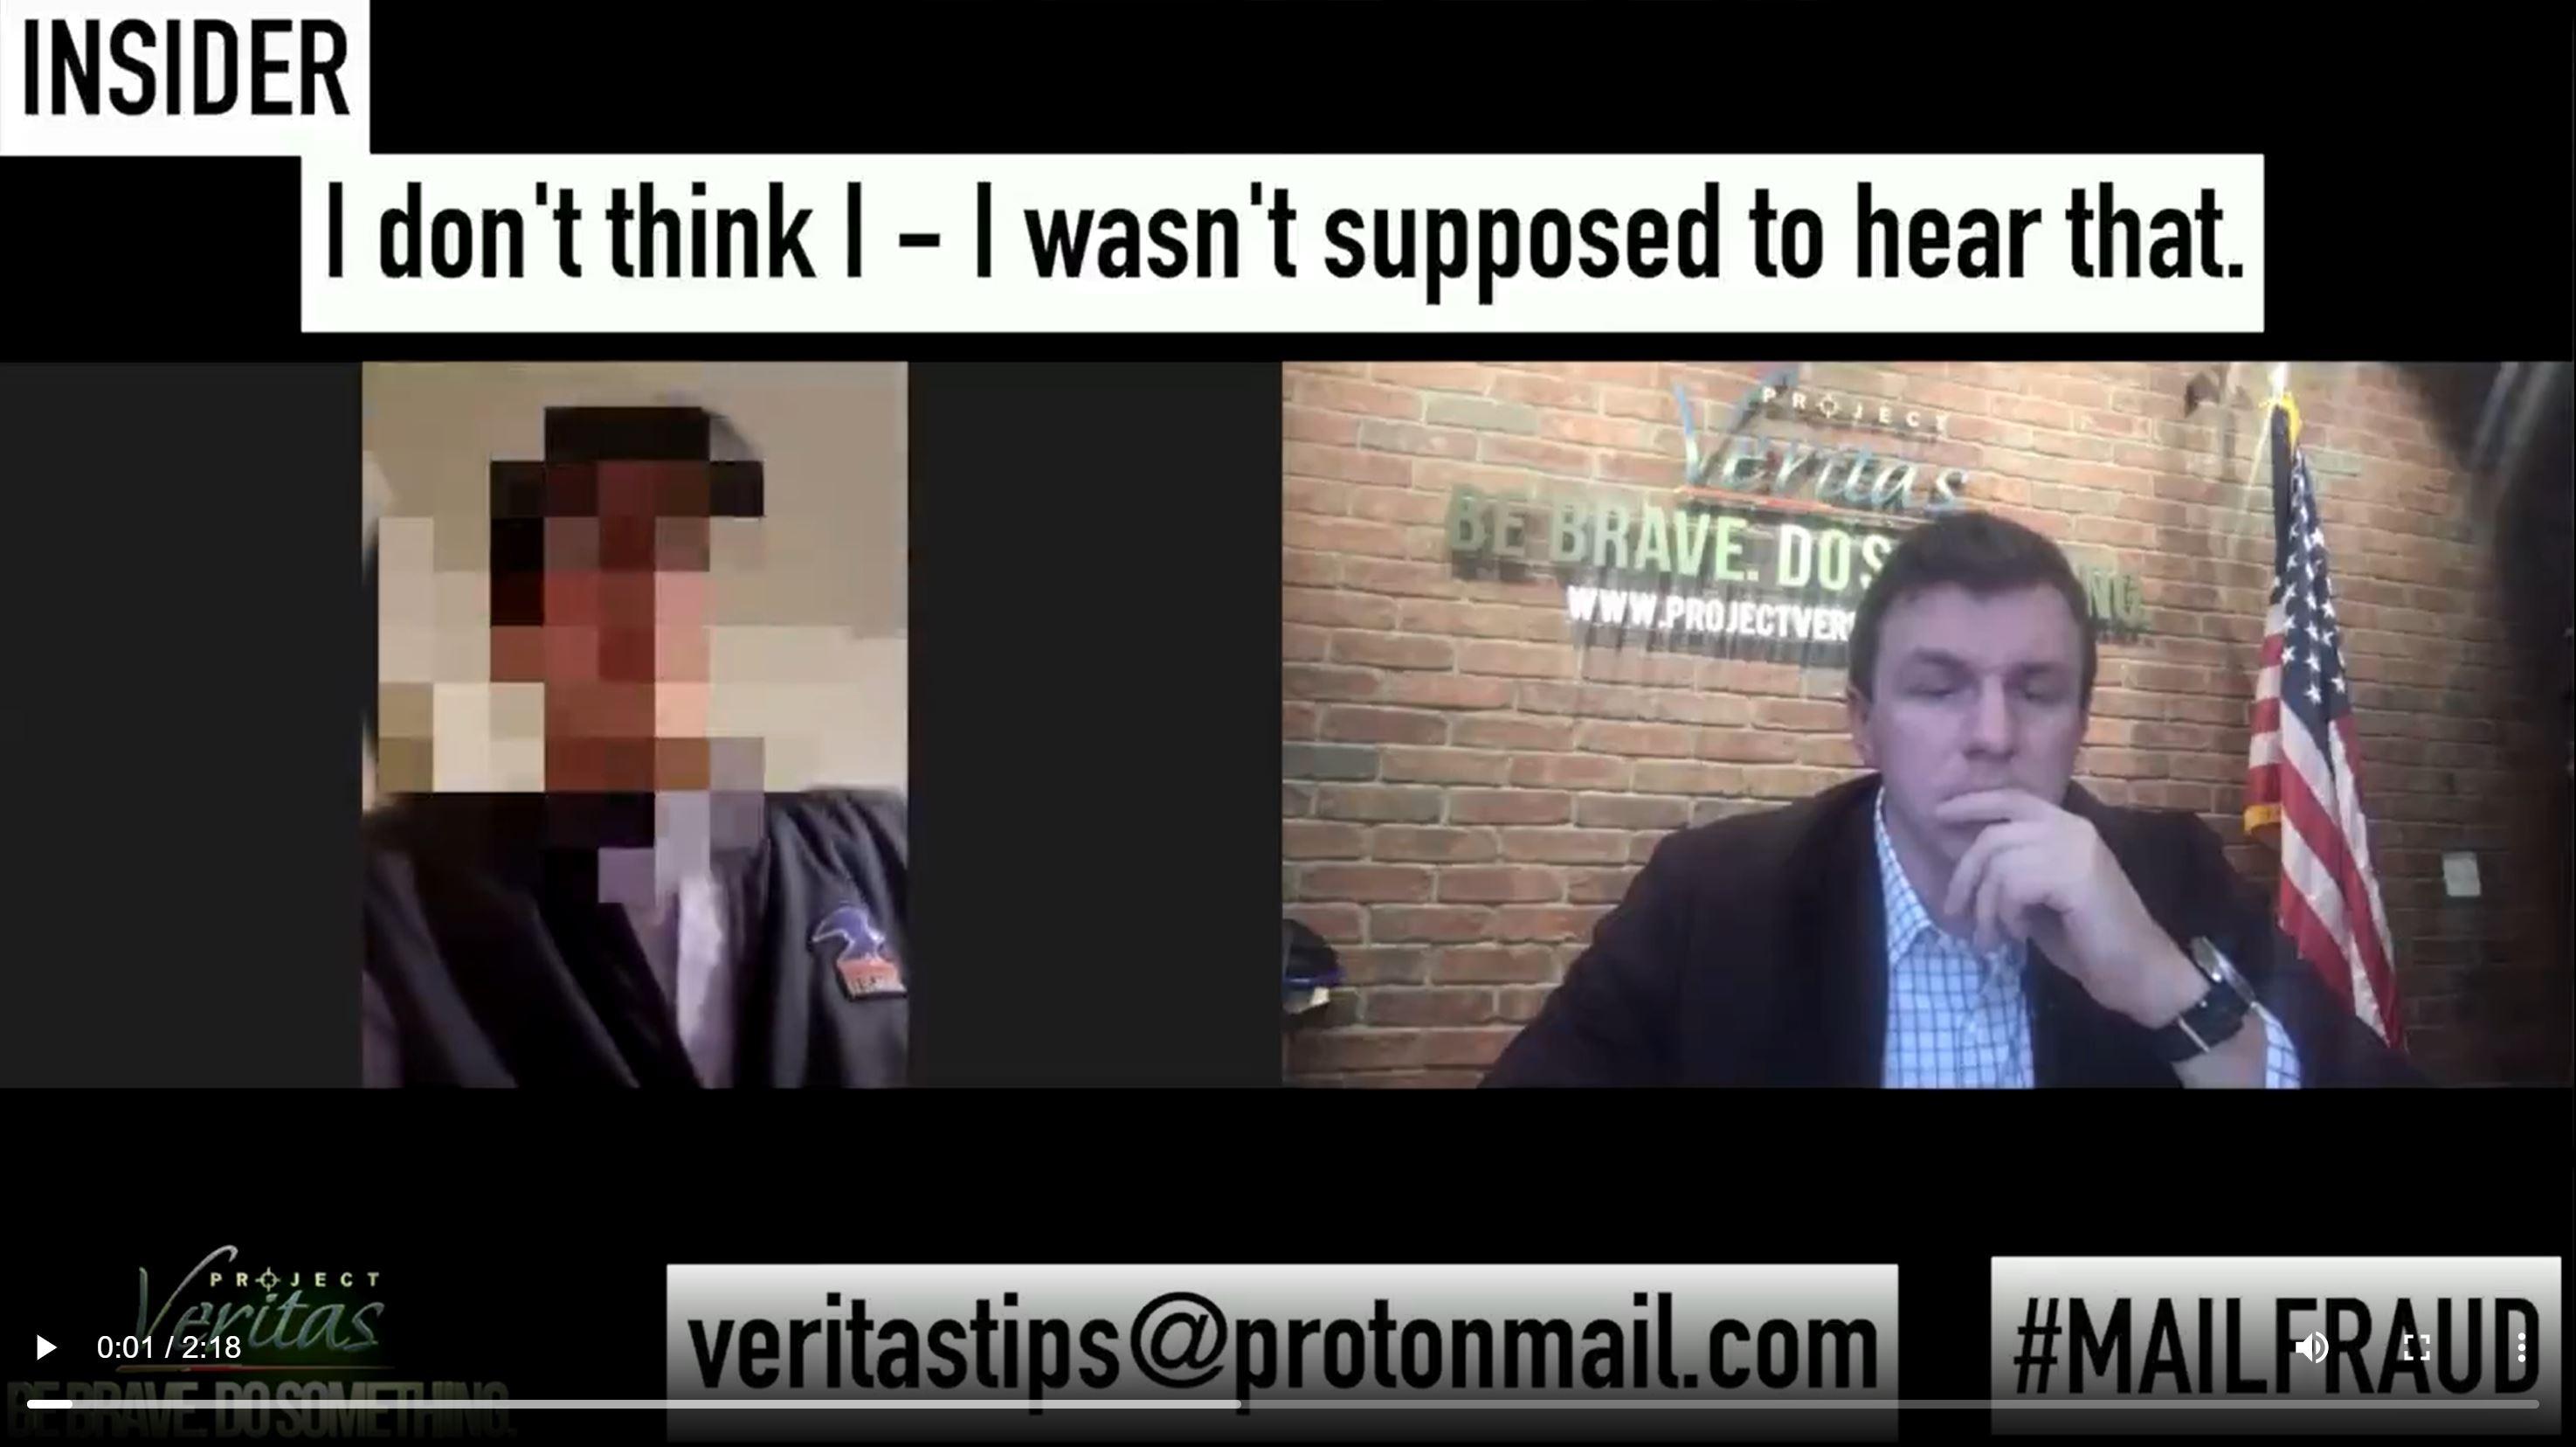 James O'Keefe. (Nov. 05, 2020). BREAKING: Pennsylvania USPS Whistleblower told to backdate ballots. Project Veritas.